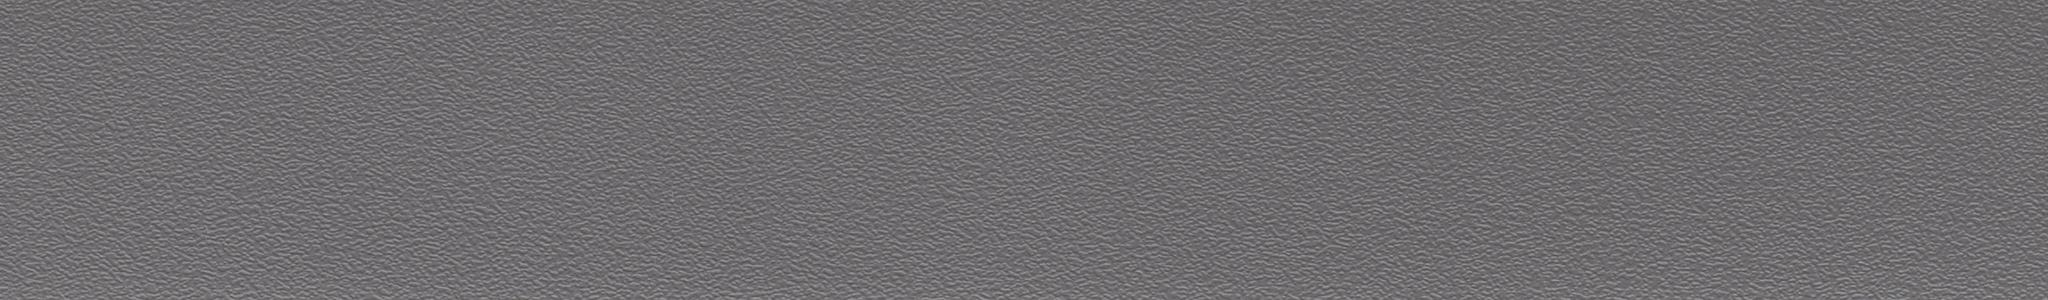 HU 173257 Кромка ABS Графит Серый - Шагрень XG